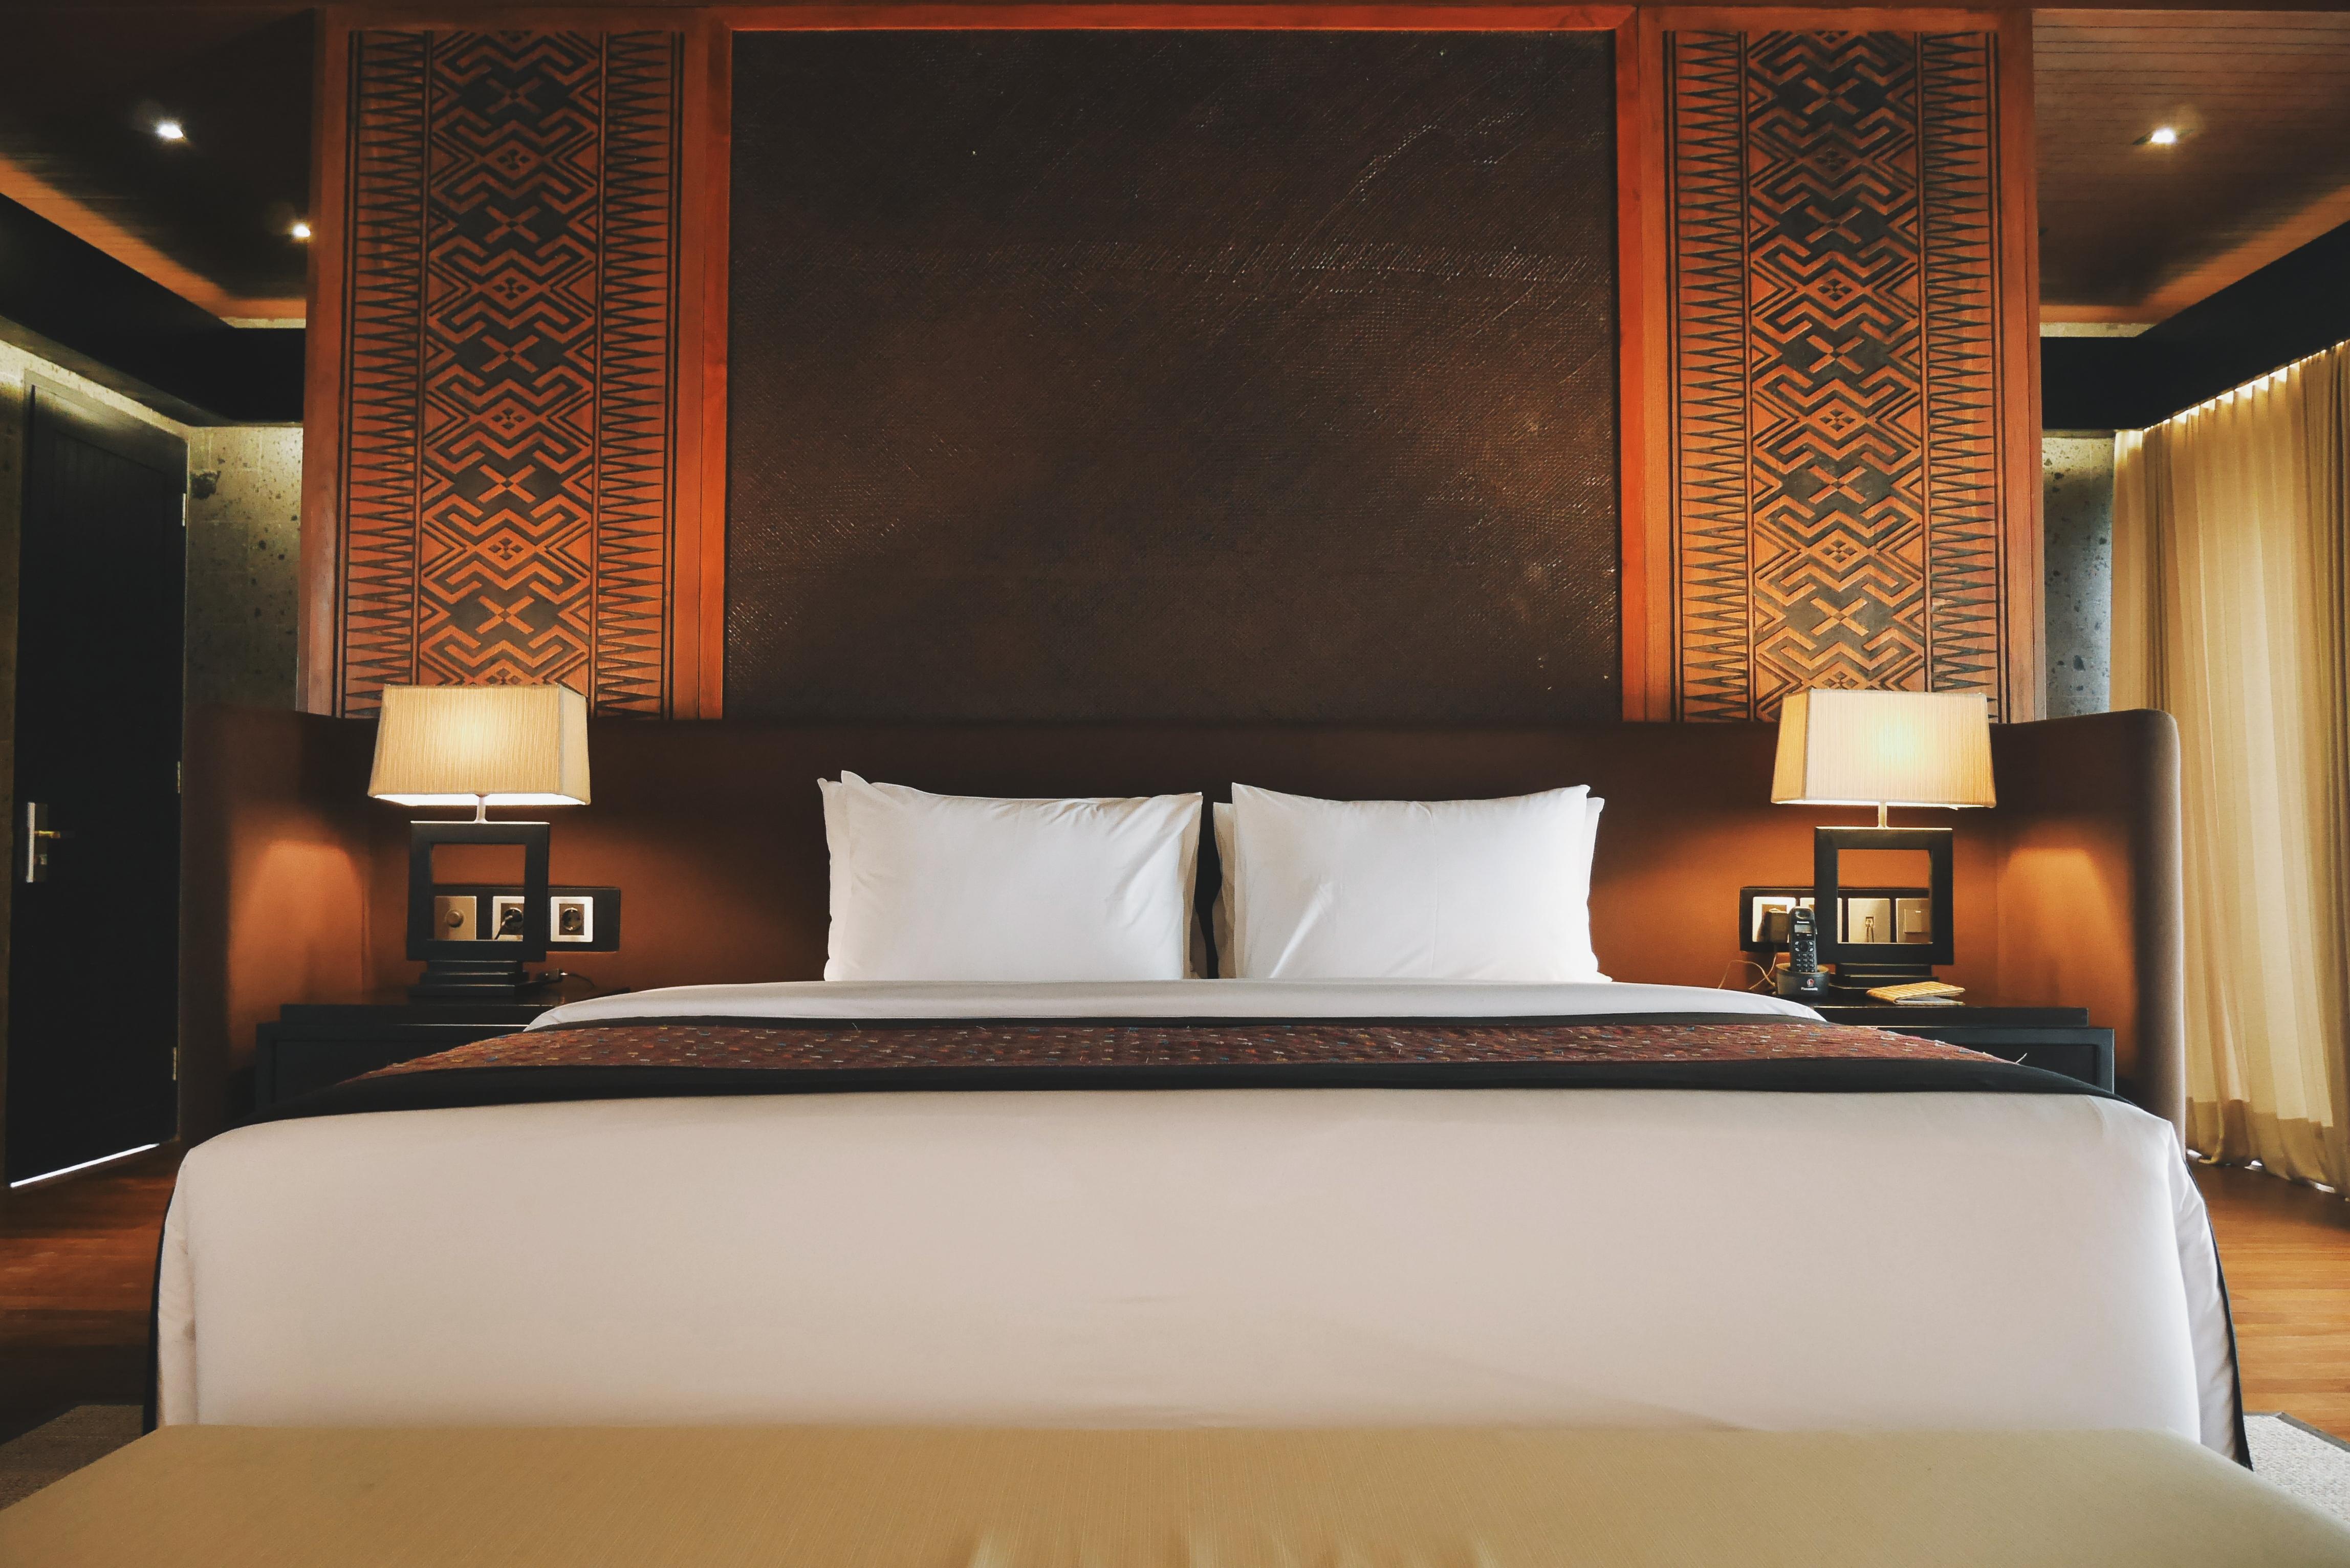 Tempat Tidur yang sangat nyaman